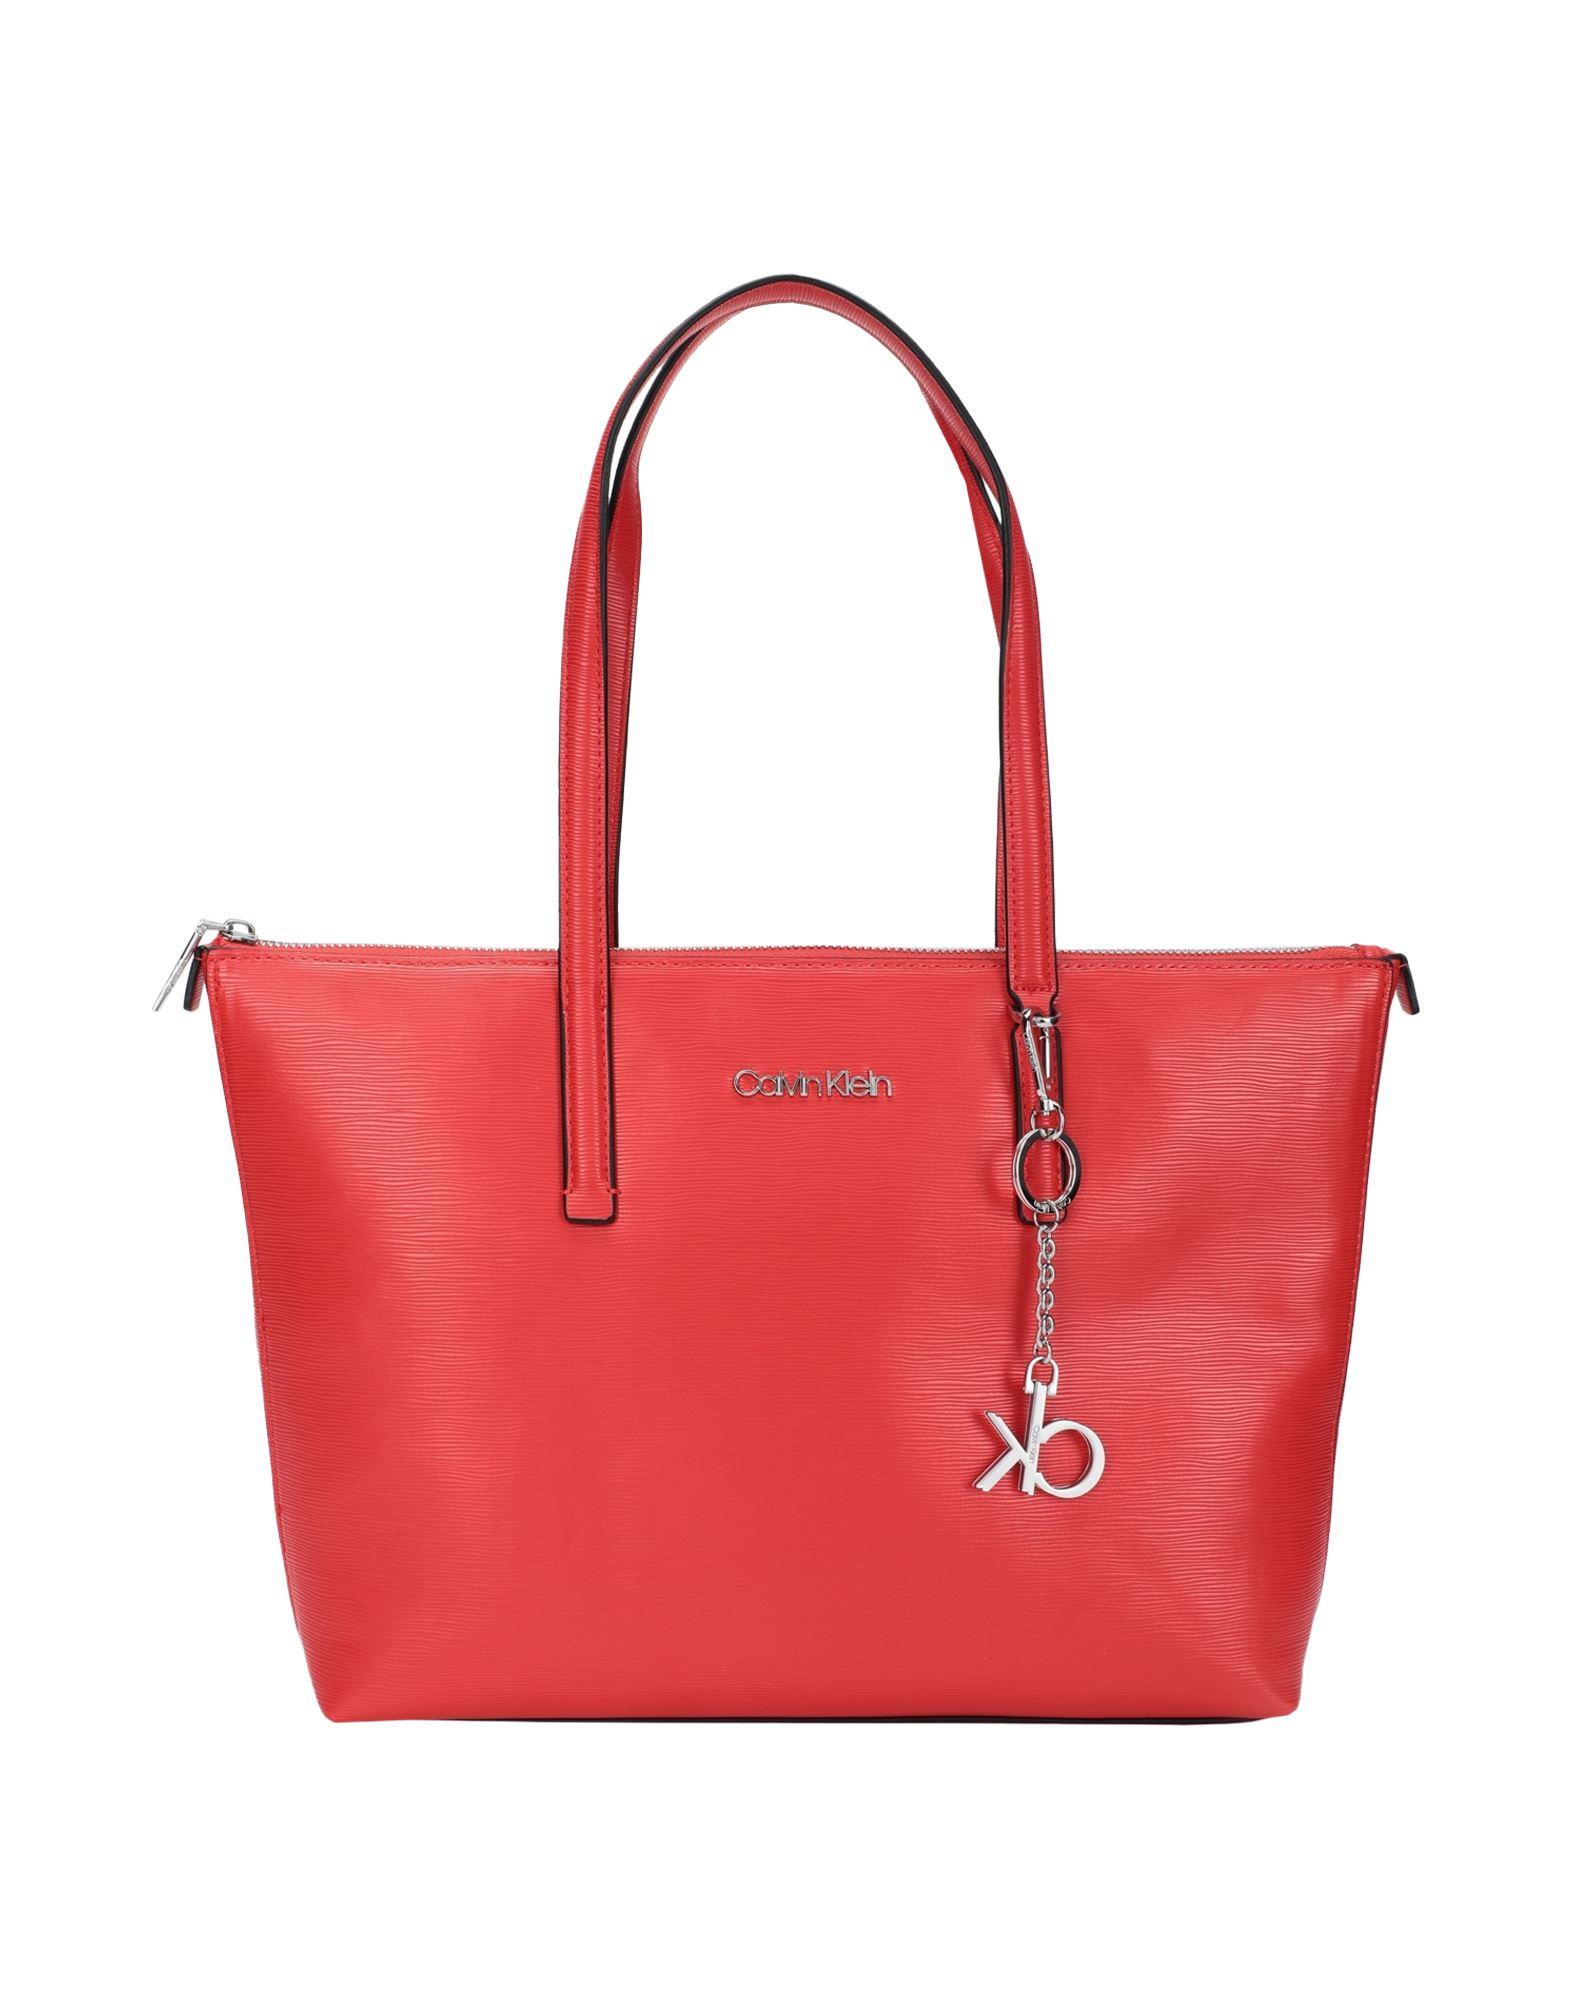 CALVIN KLEIN Shoulder bags - Item 45568853